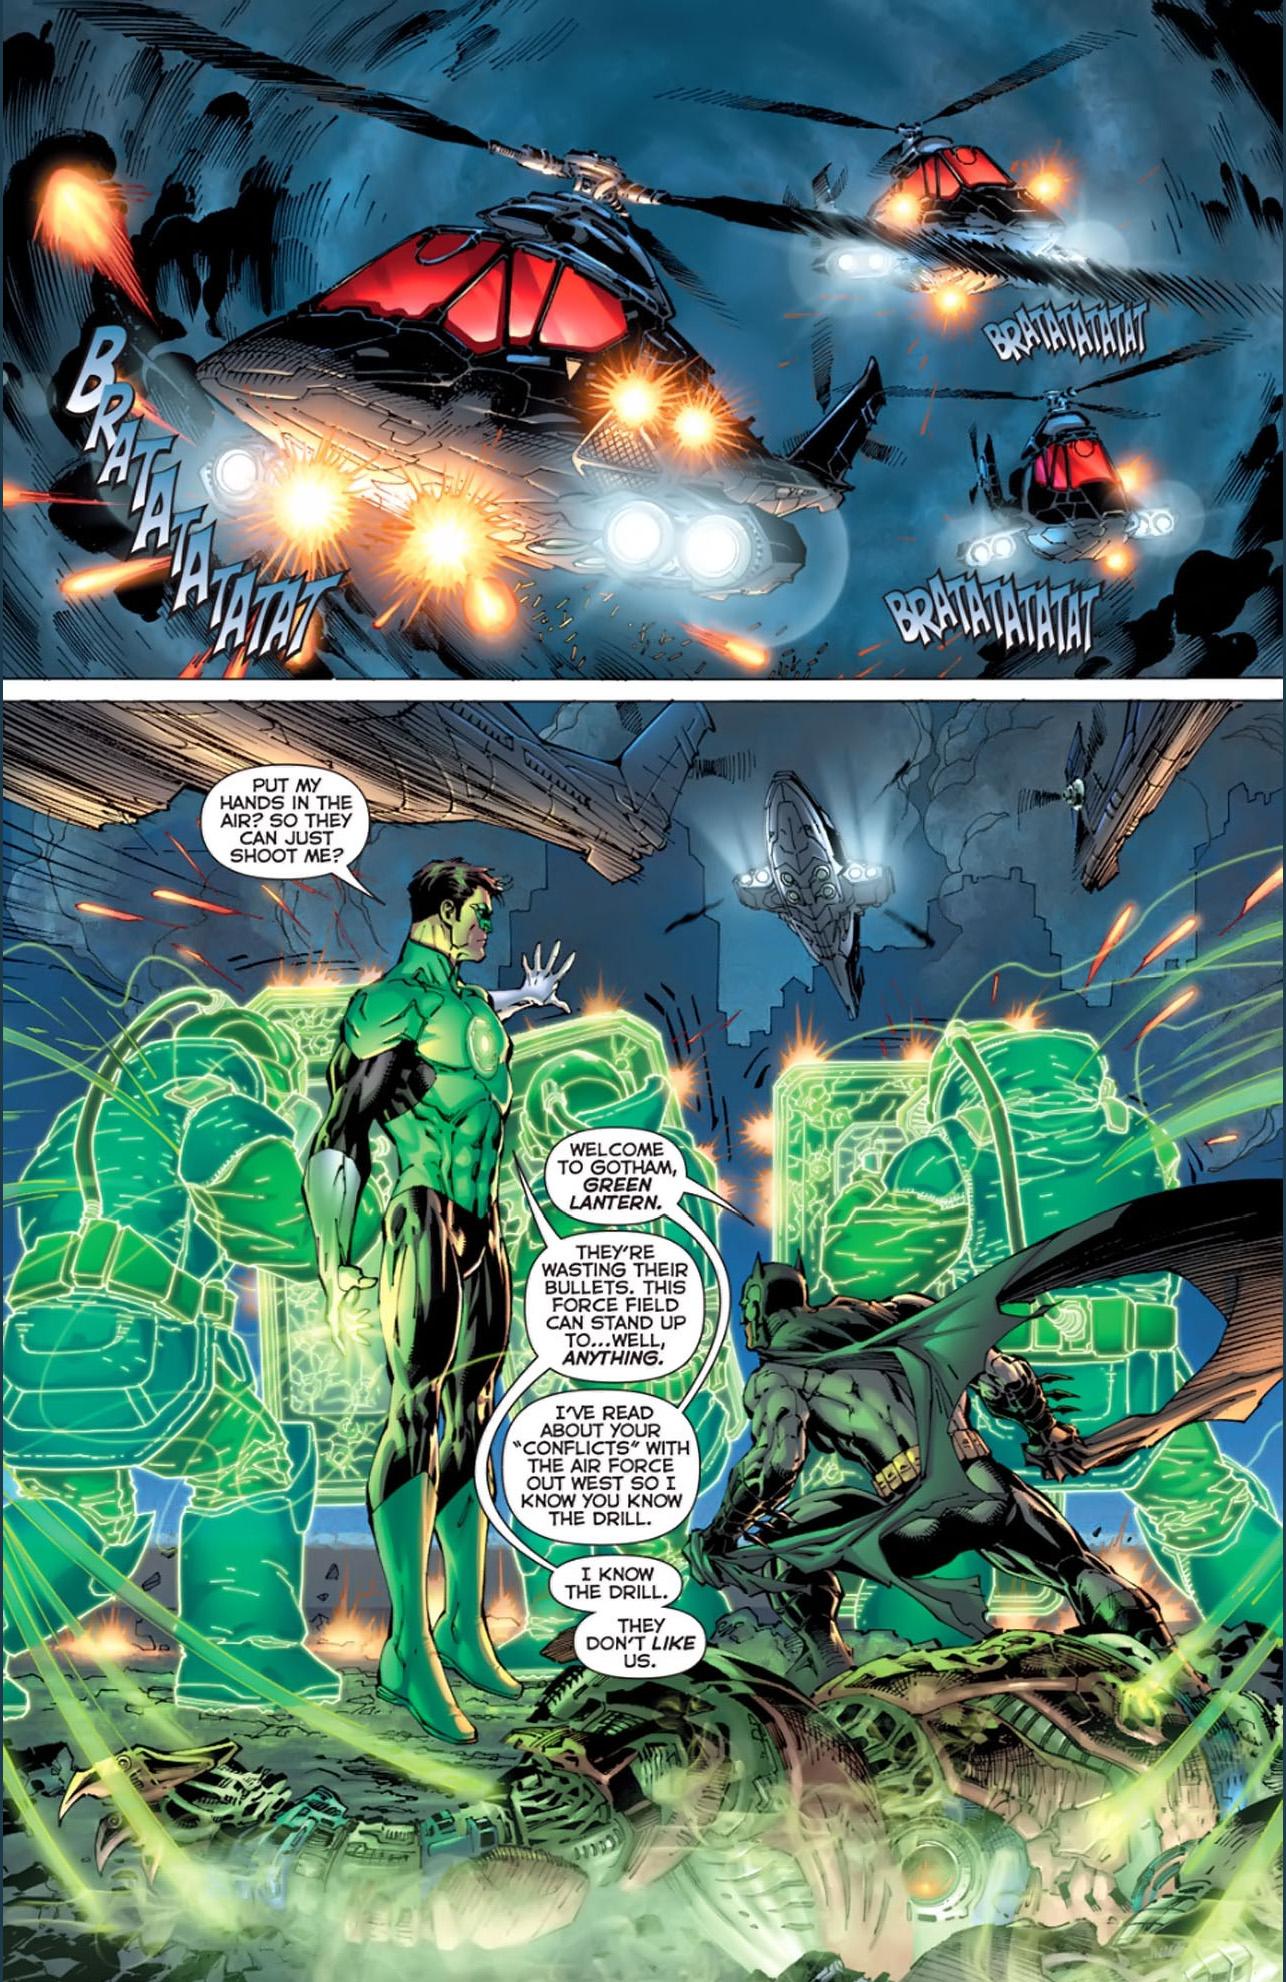 Green Lantern Ring Green Lantern and Batm...